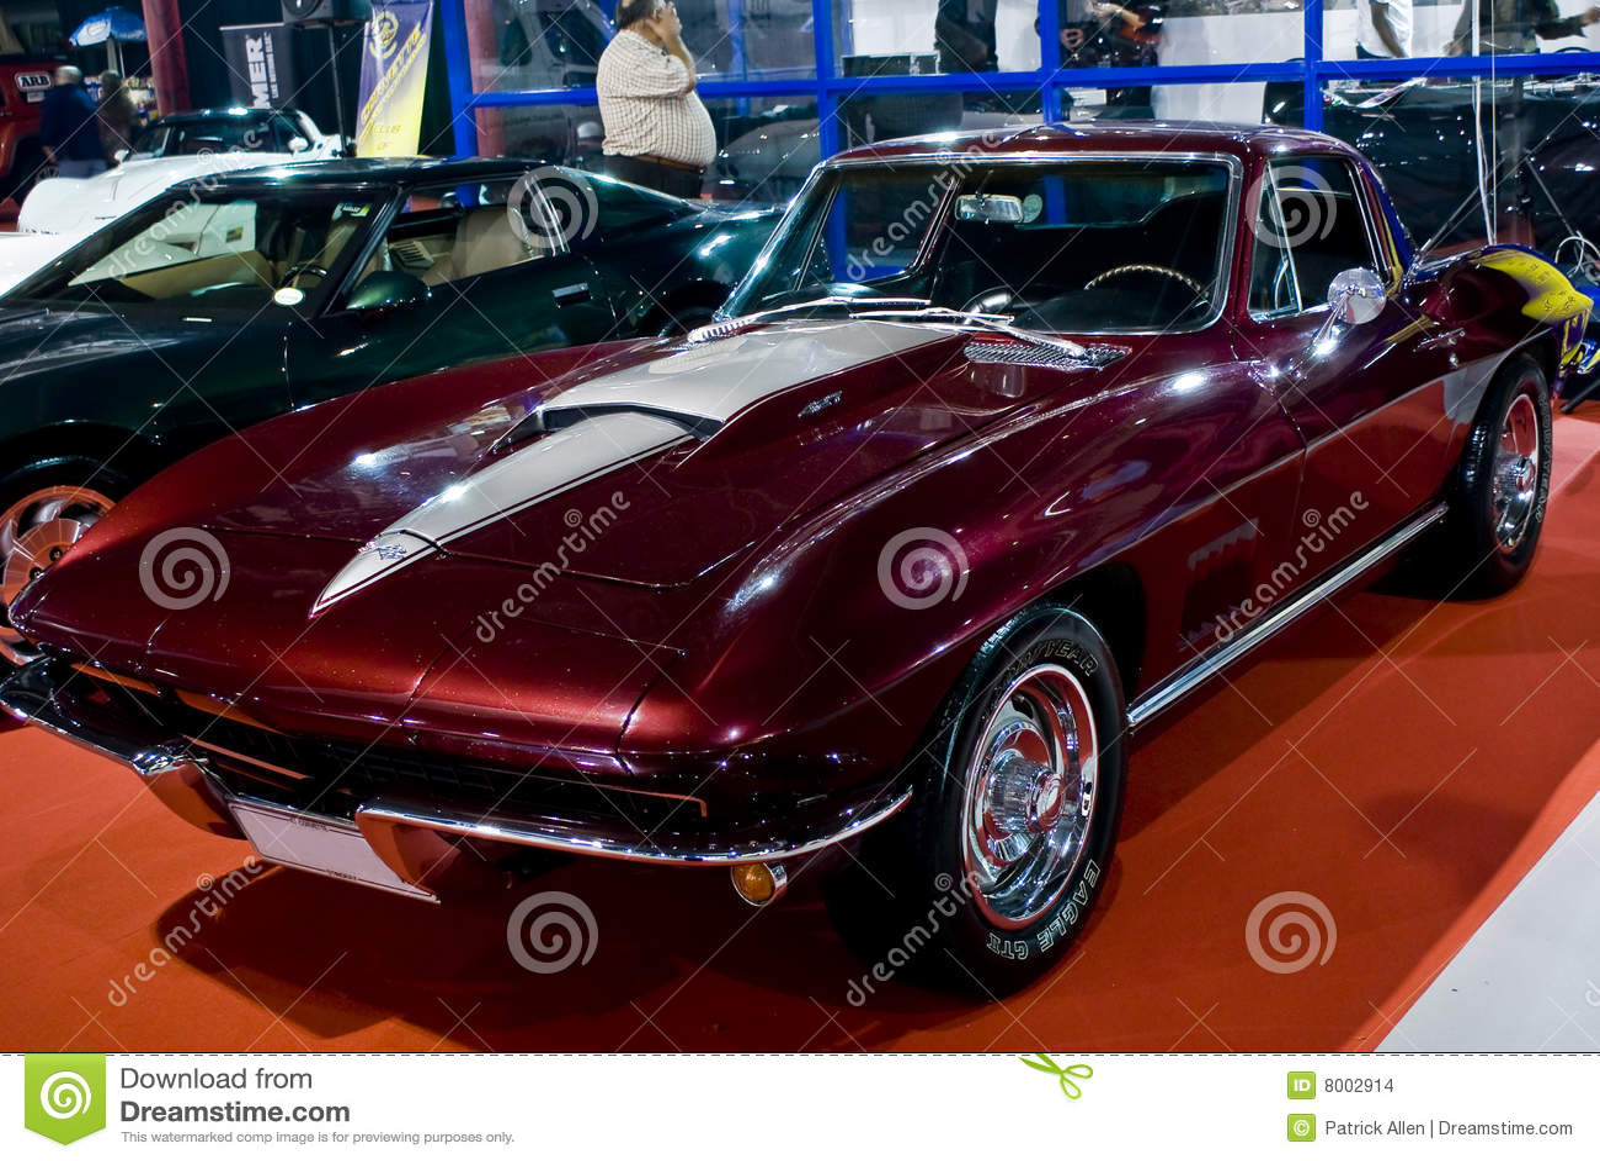 corvette stingray 1967 mph editorial stock image image 8002914. Black Bedroom Furniture Sets. Home Design Ideas